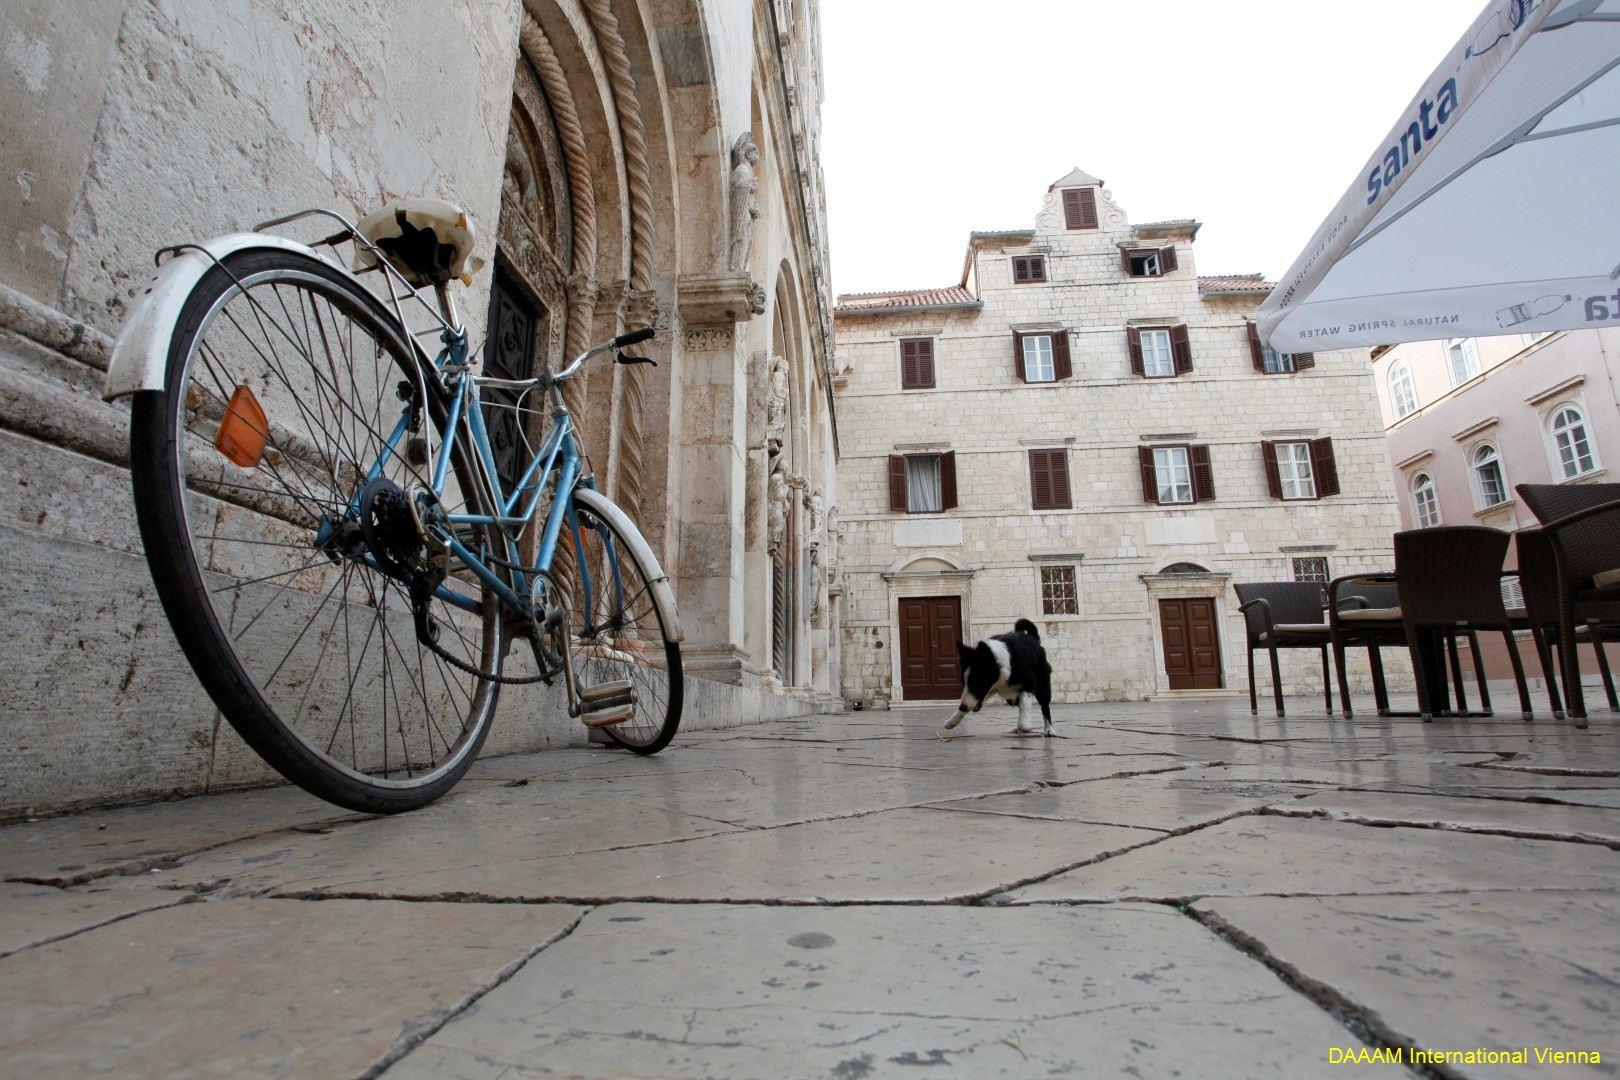 DAAAM_2012_Zadar_00_Zadar_City_057